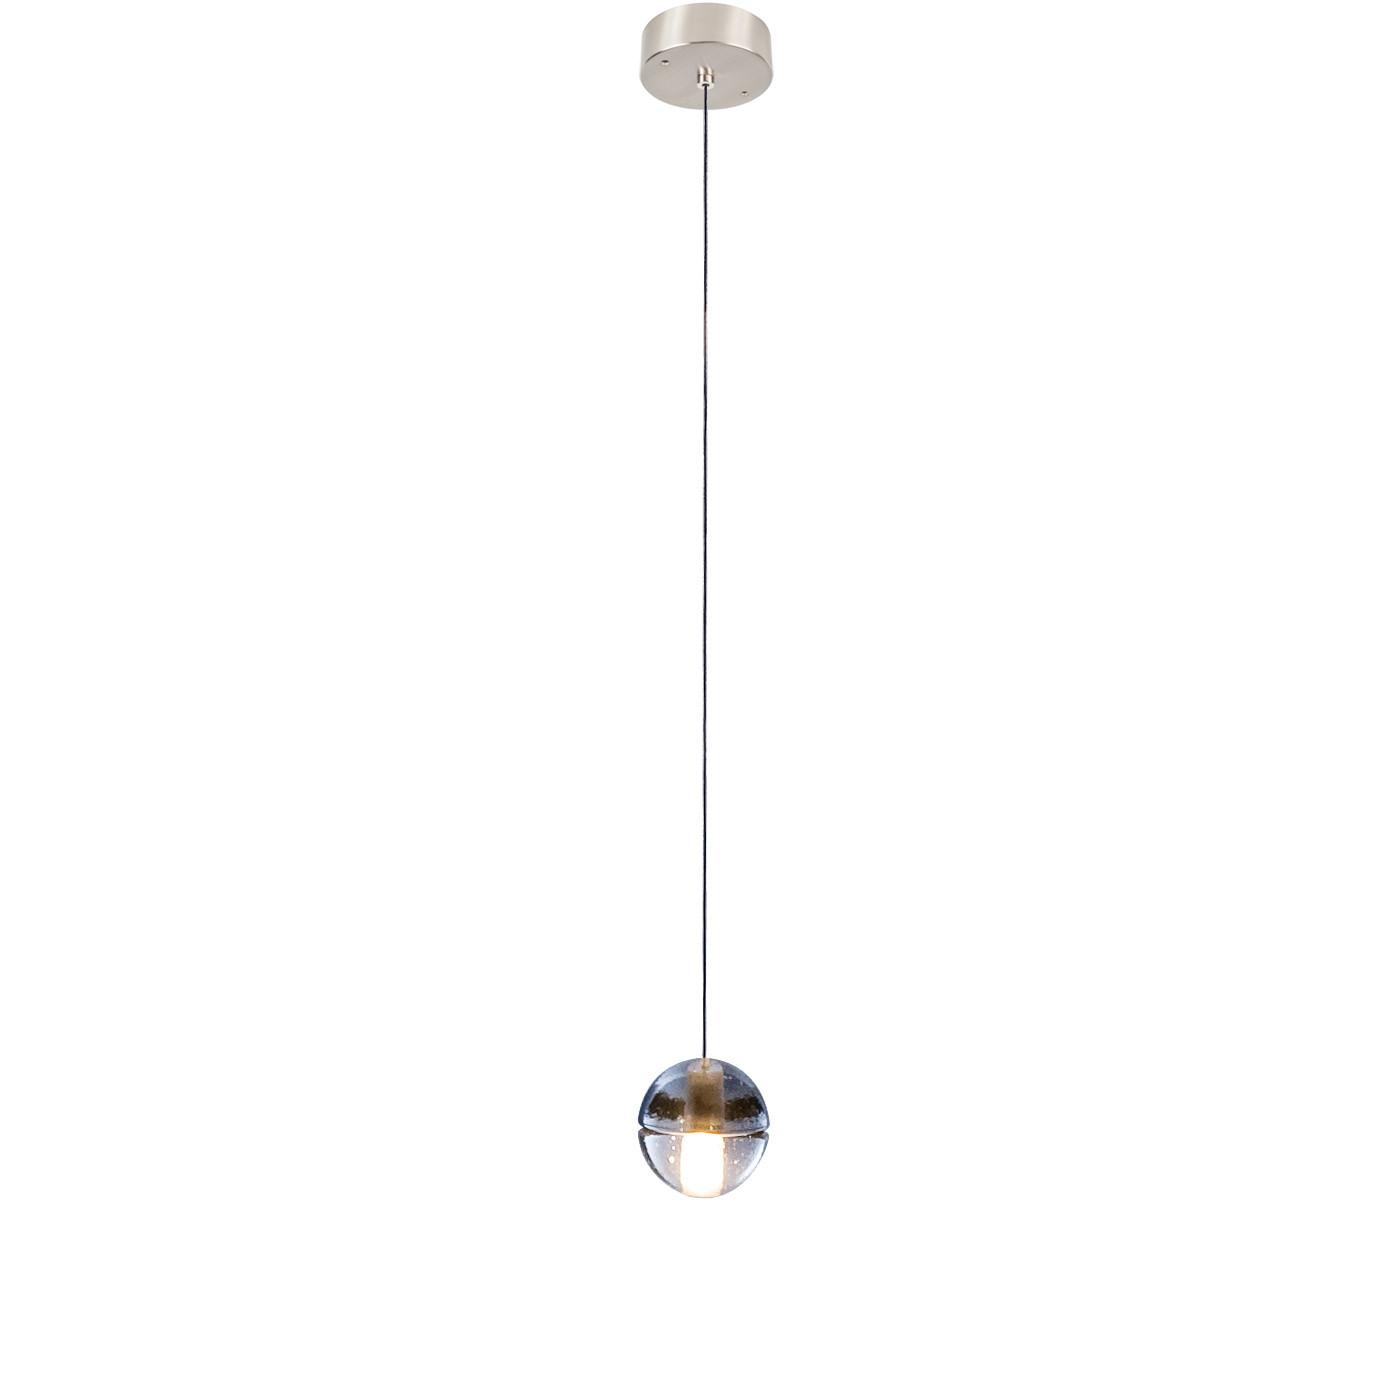 Bocci 14.1 Pendelleuchte LED